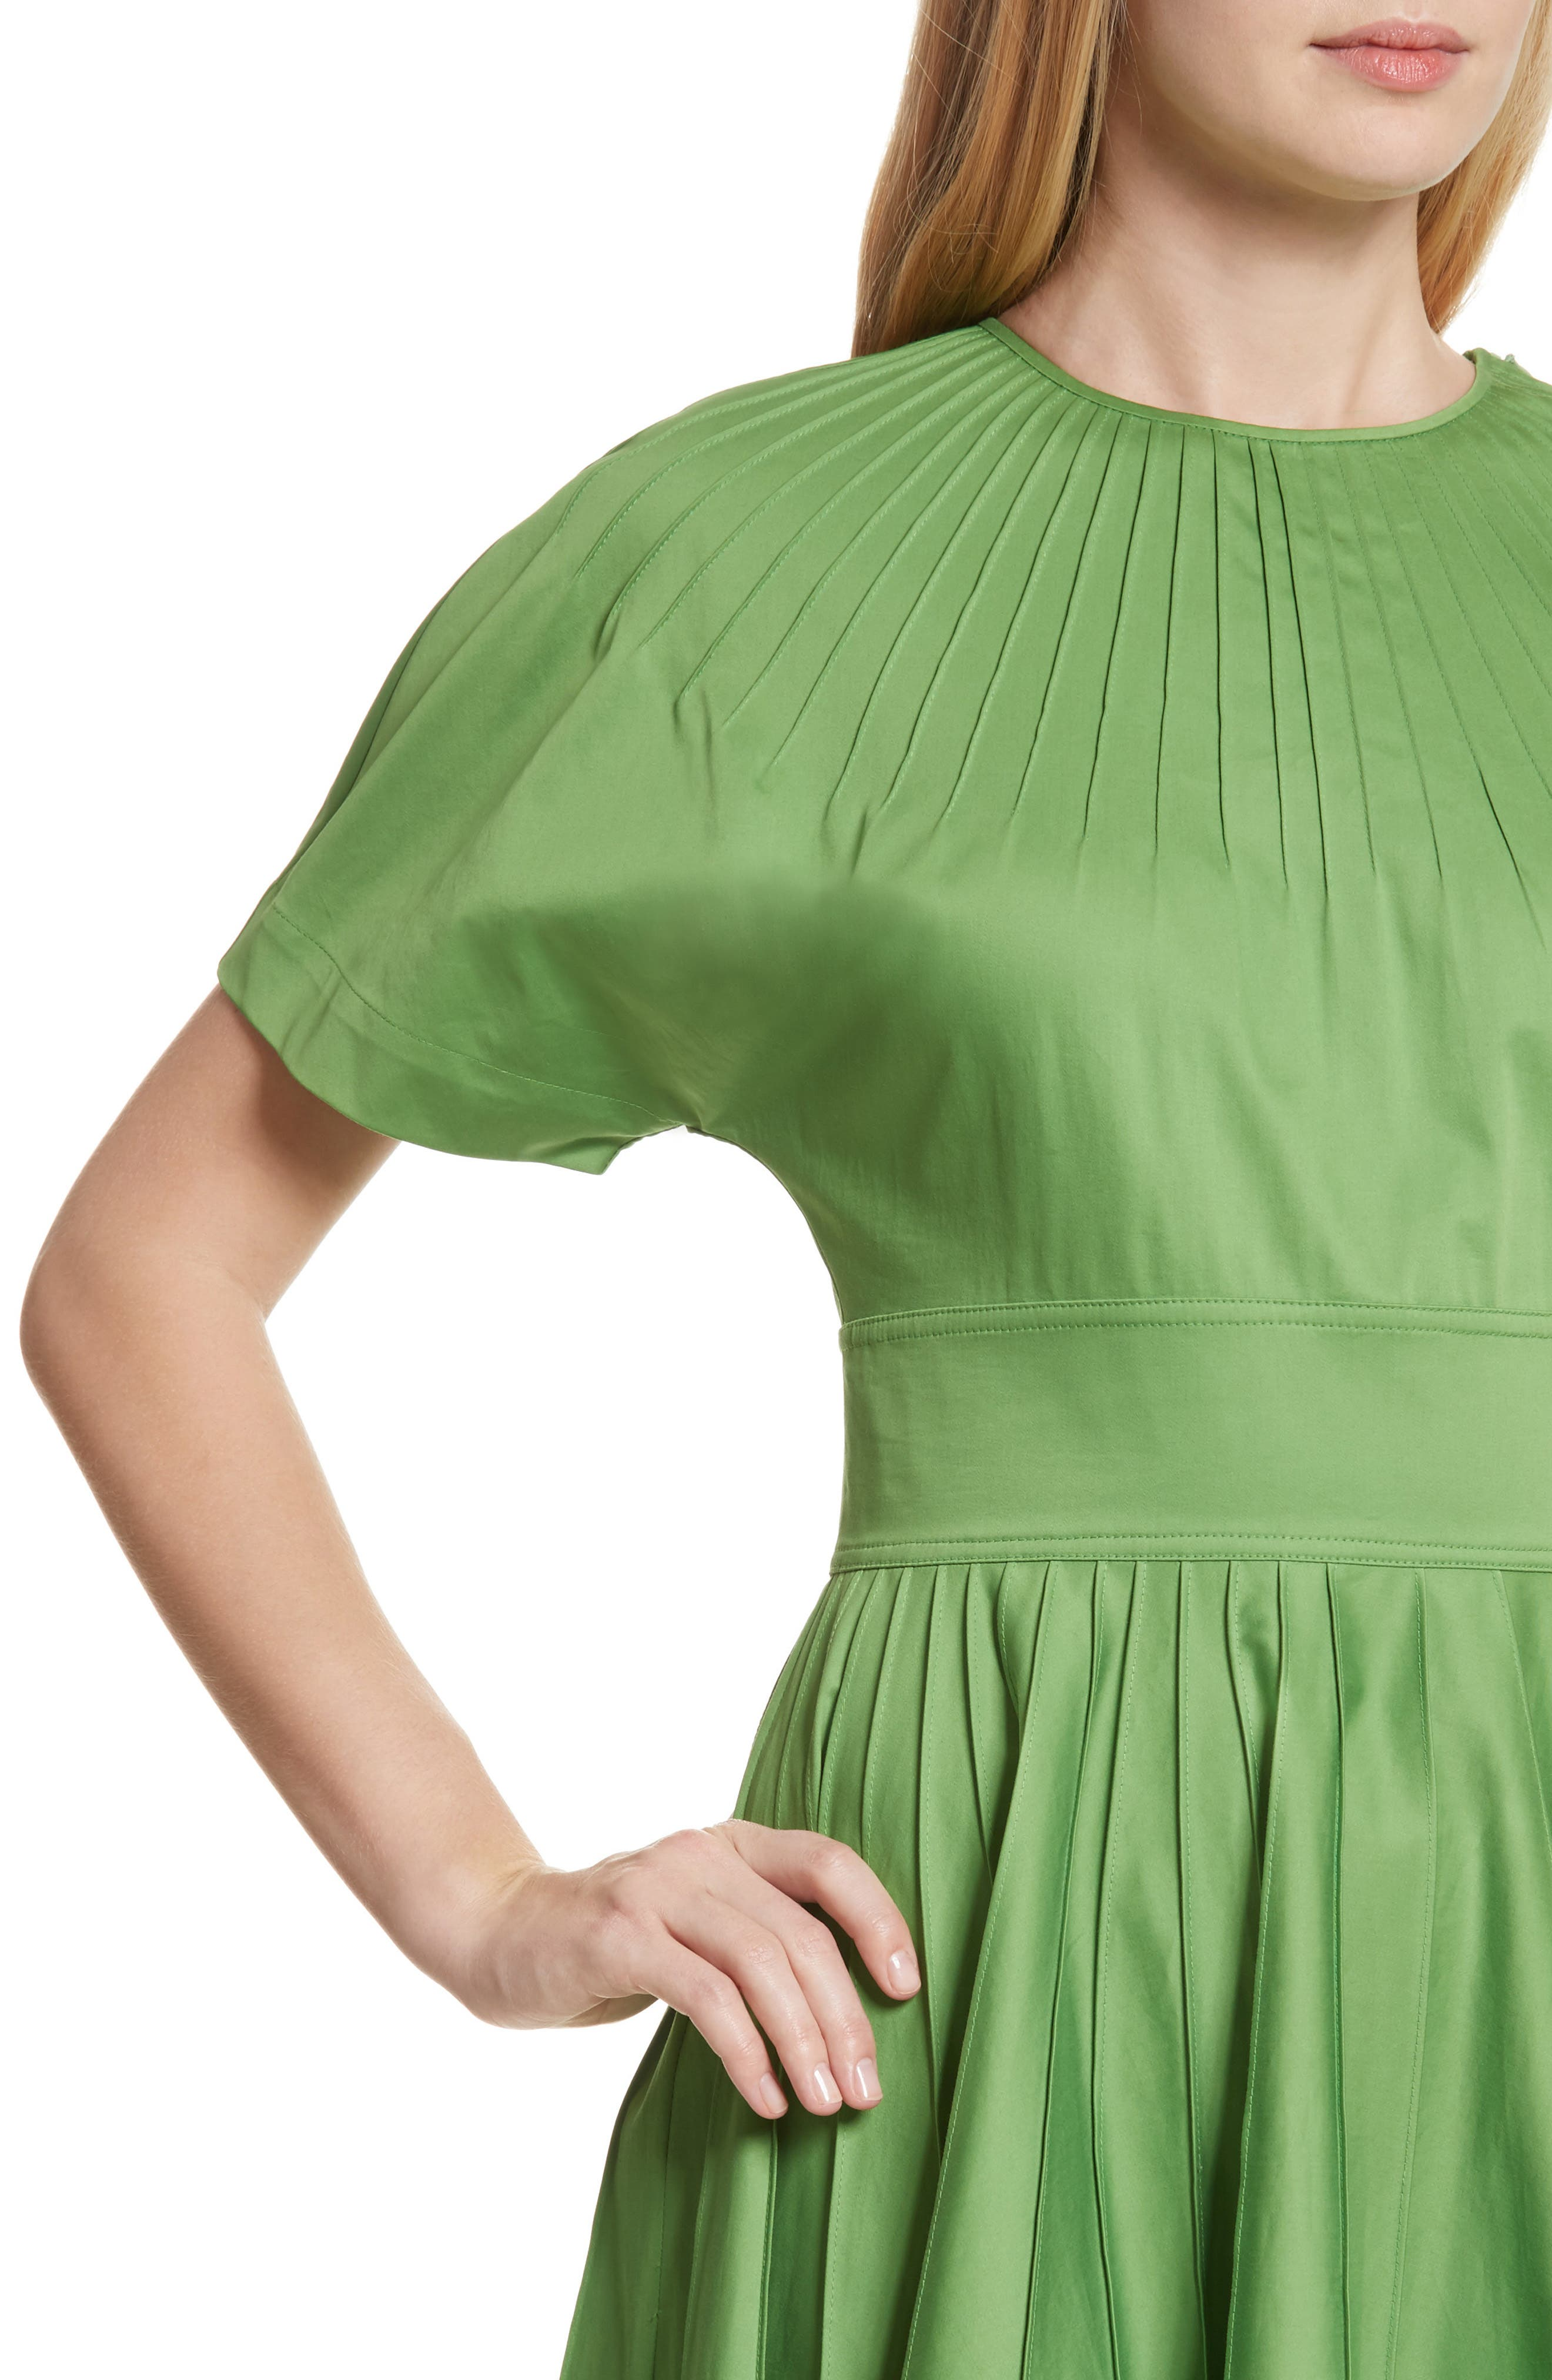 Diane von Furstenberg Pintuck Dress,                             Alternate thumbnail 4, color,                             Grass